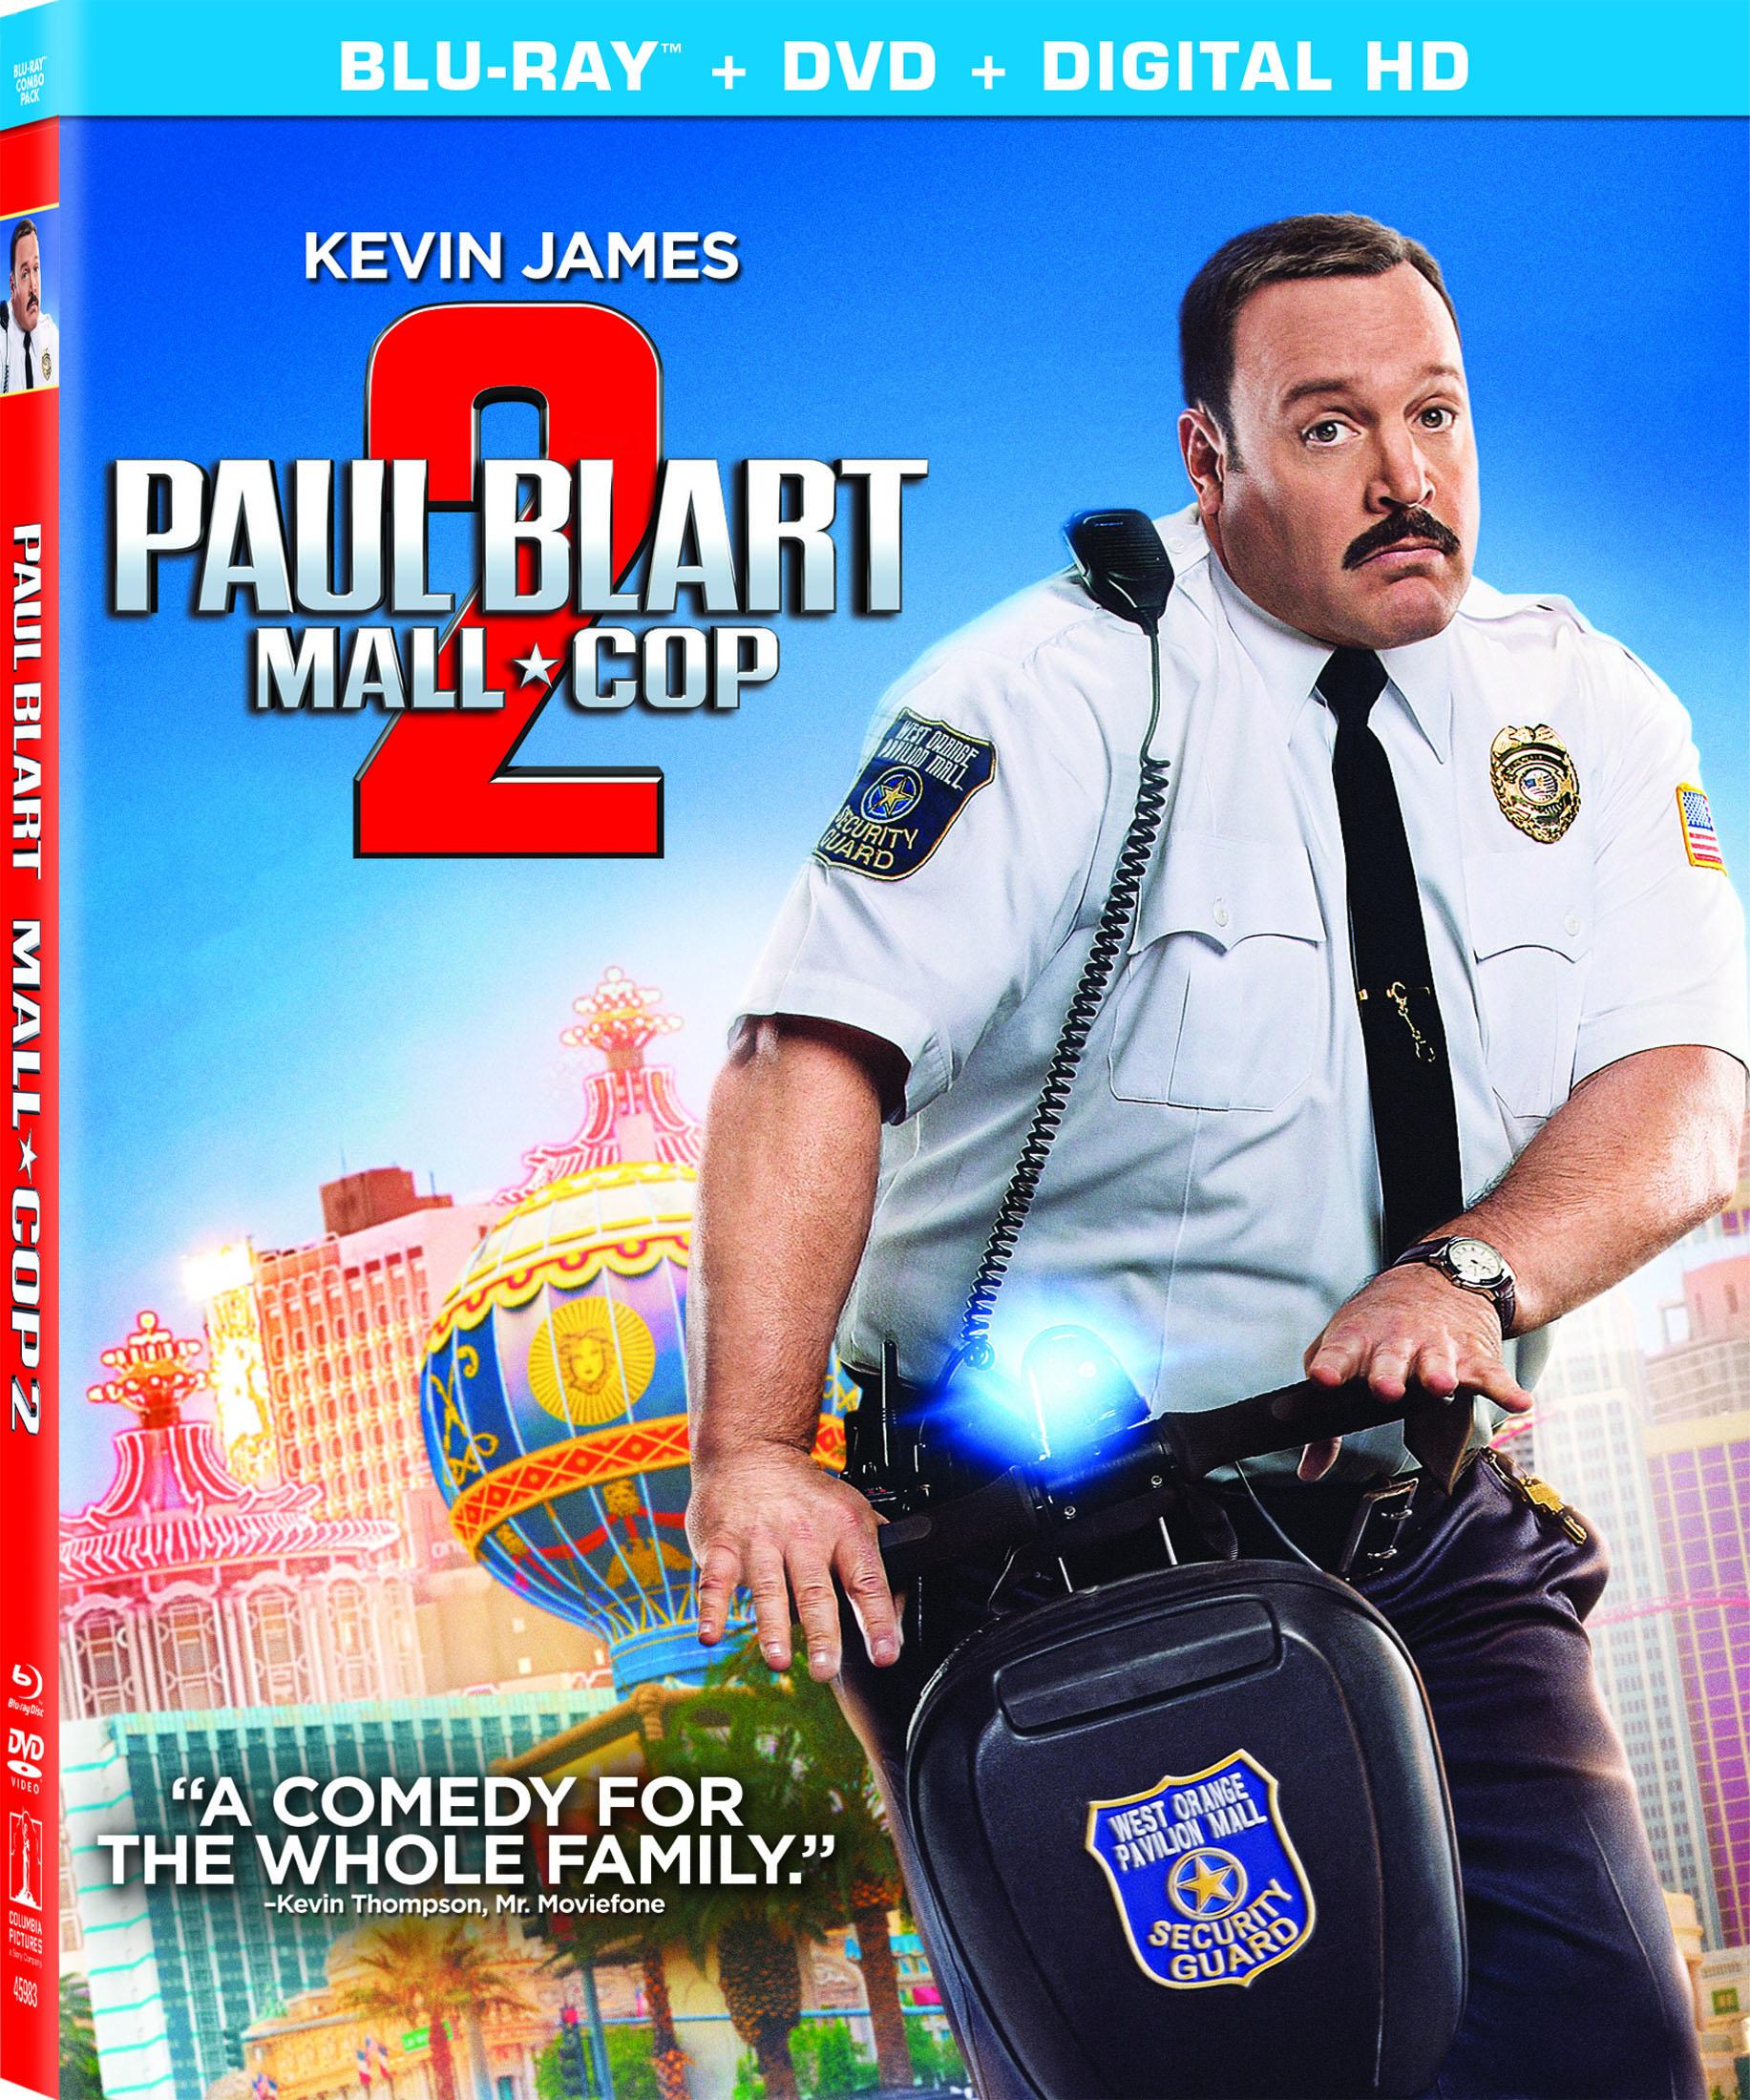 Paul Blart Mall Cop 2 Blu-ray Review